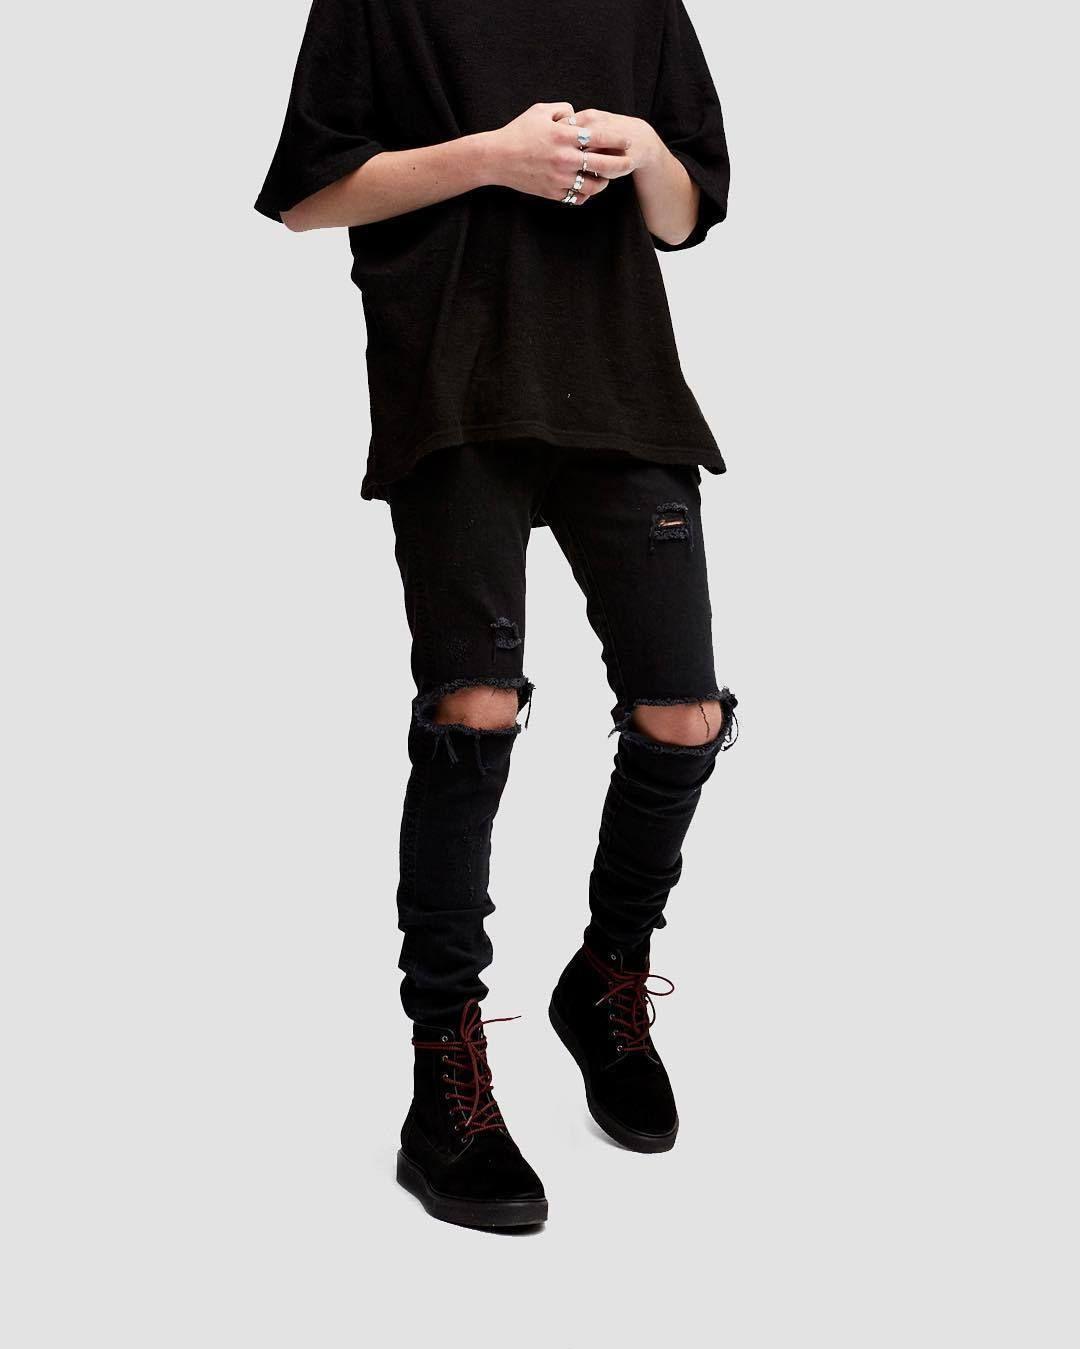 Dear2019 Holes Hatch Knee Male Self-cultivation Bound Feet Trend Black Classic Knife Beggar Jeans